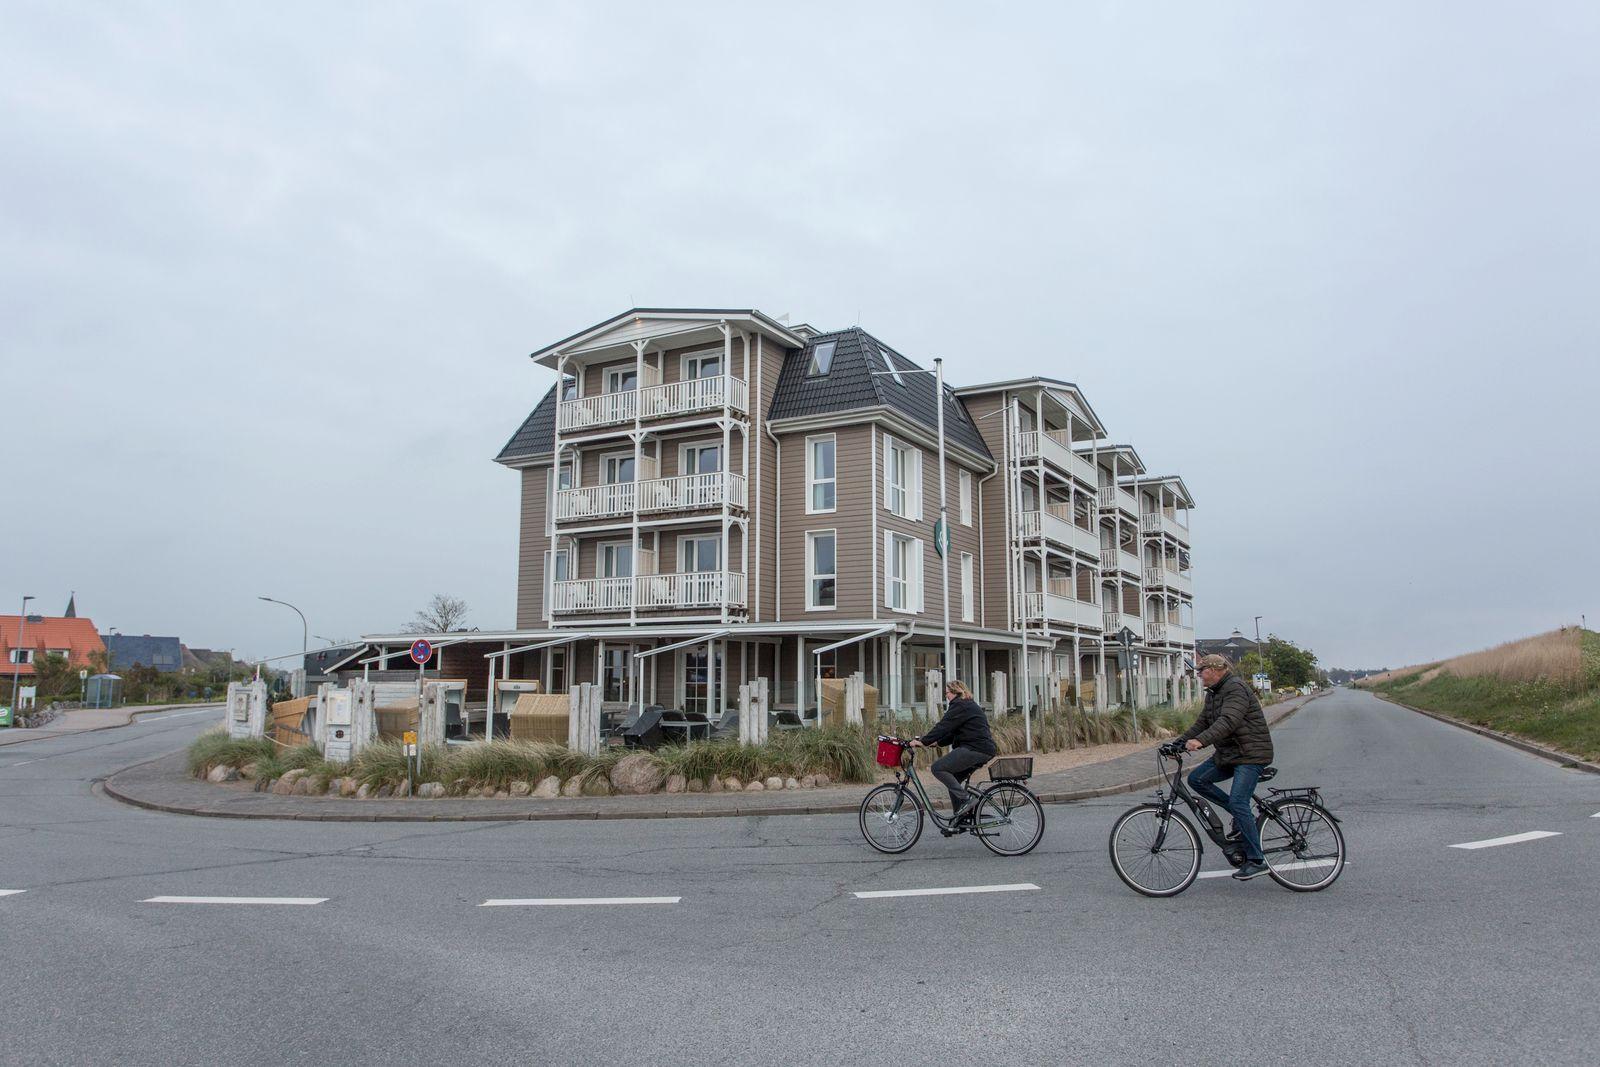 Hotelöffnungen in St. Peter-Ording.